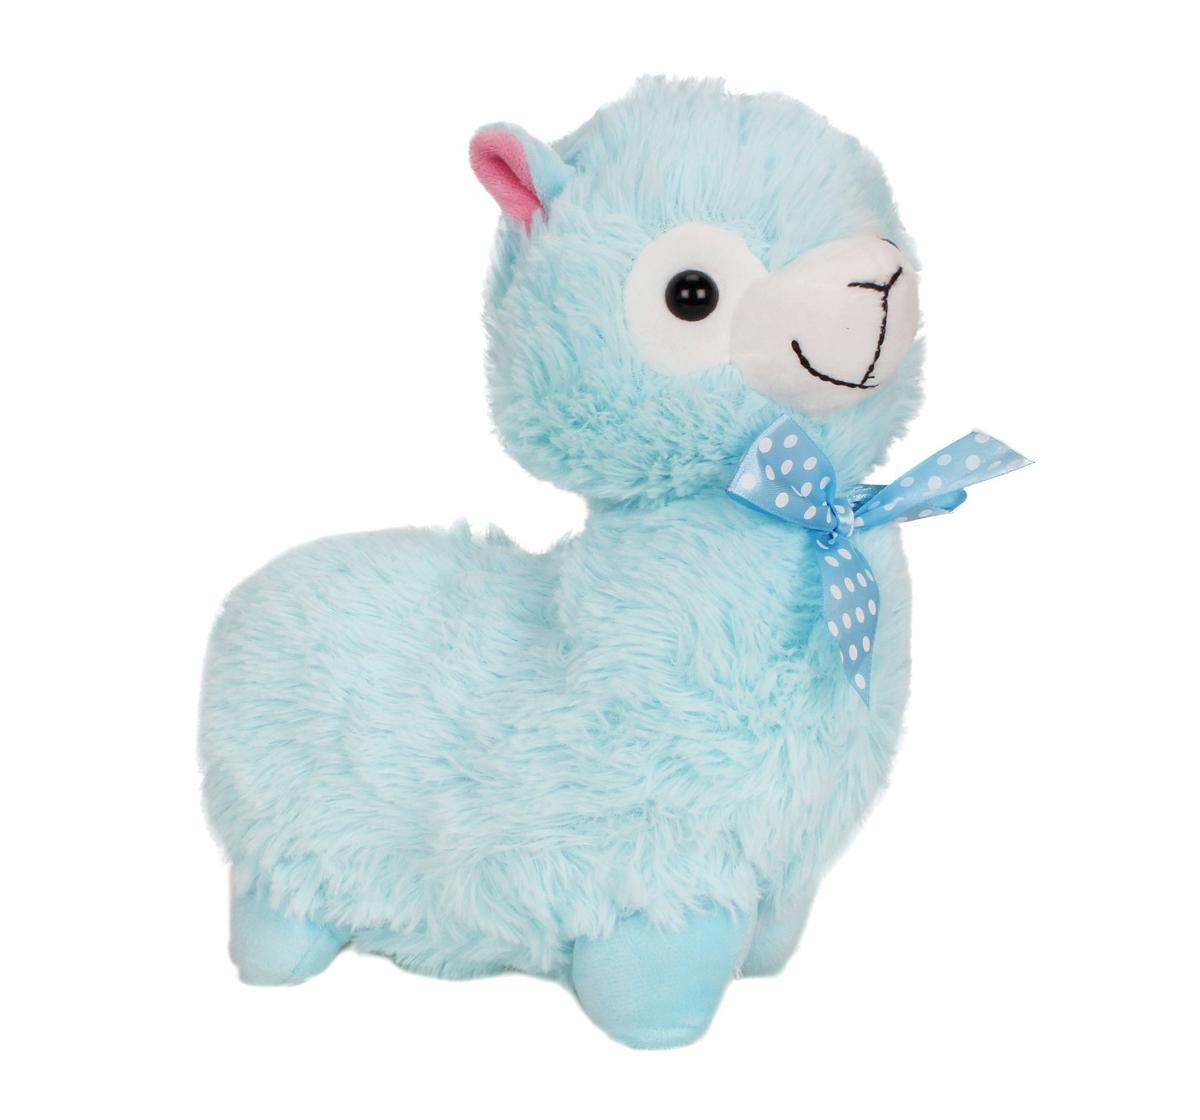 Fuzzbuzz | Fuzzbuzz Llama Stuffed Plush Toy - Blue - 28Cm Quirky Soft Toys for Kids age 0M+ - 28 Cm (Blue)